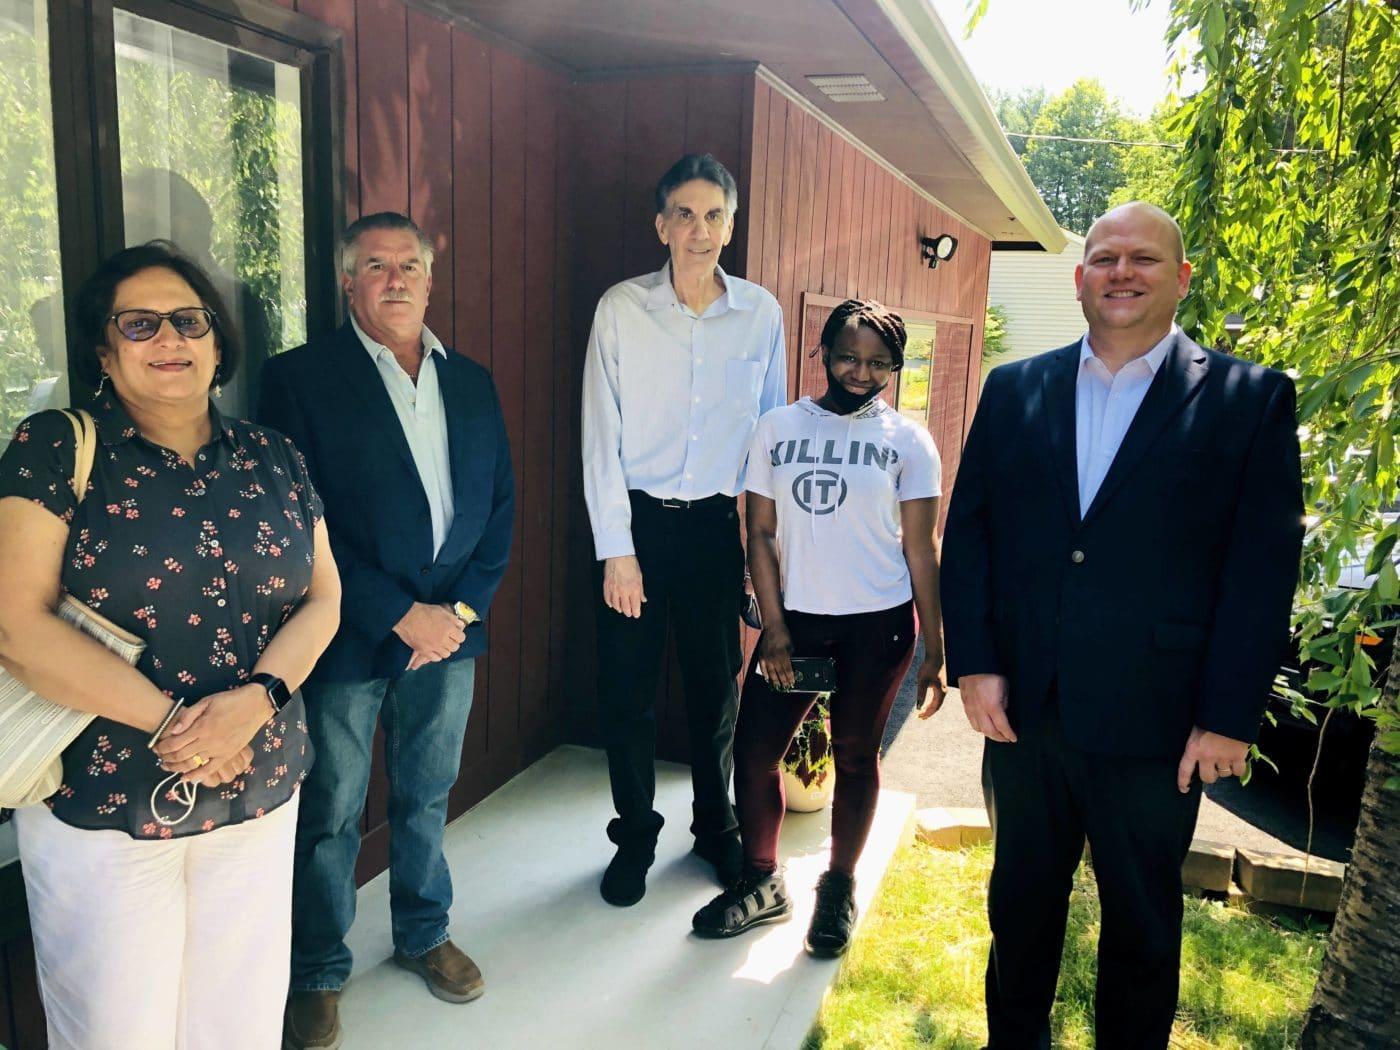 Ann Grover, Ken Bierman, Ron Schmalz, and Bryan Bidlack join Veronica McLean outside her new home.